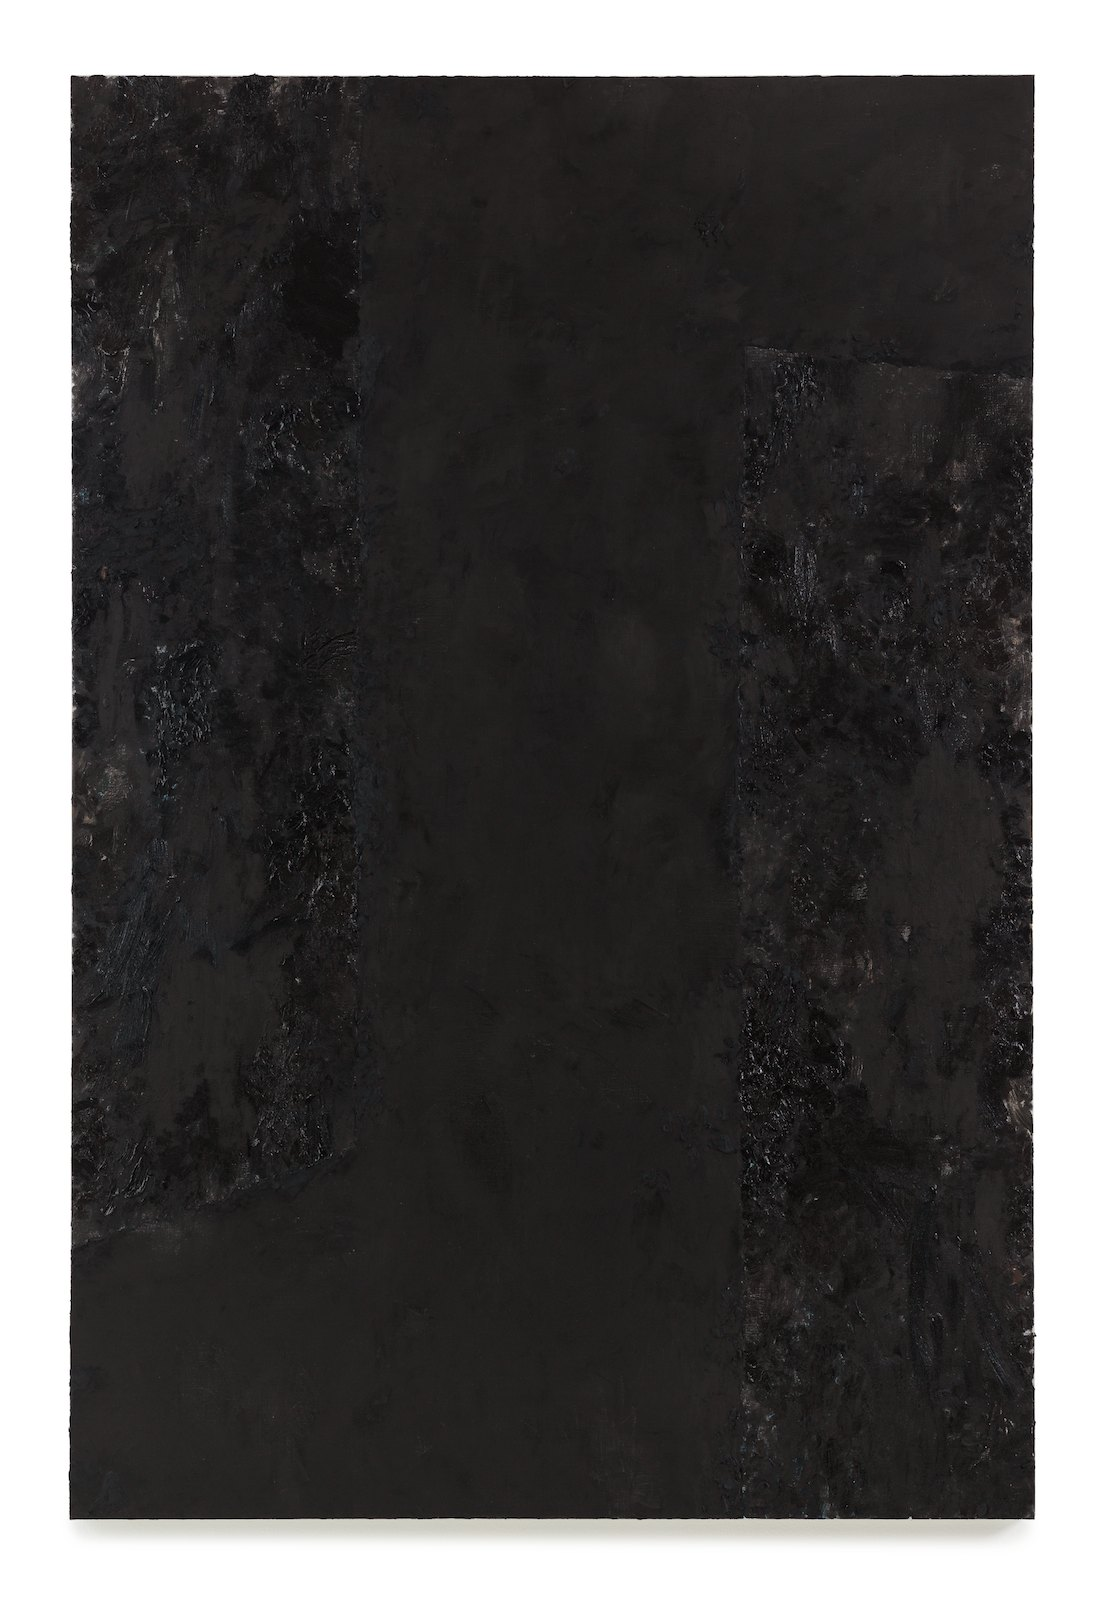 Viktor Kopp, Two Corners Black, 2014, oil on canvas, 183 x 122 cm